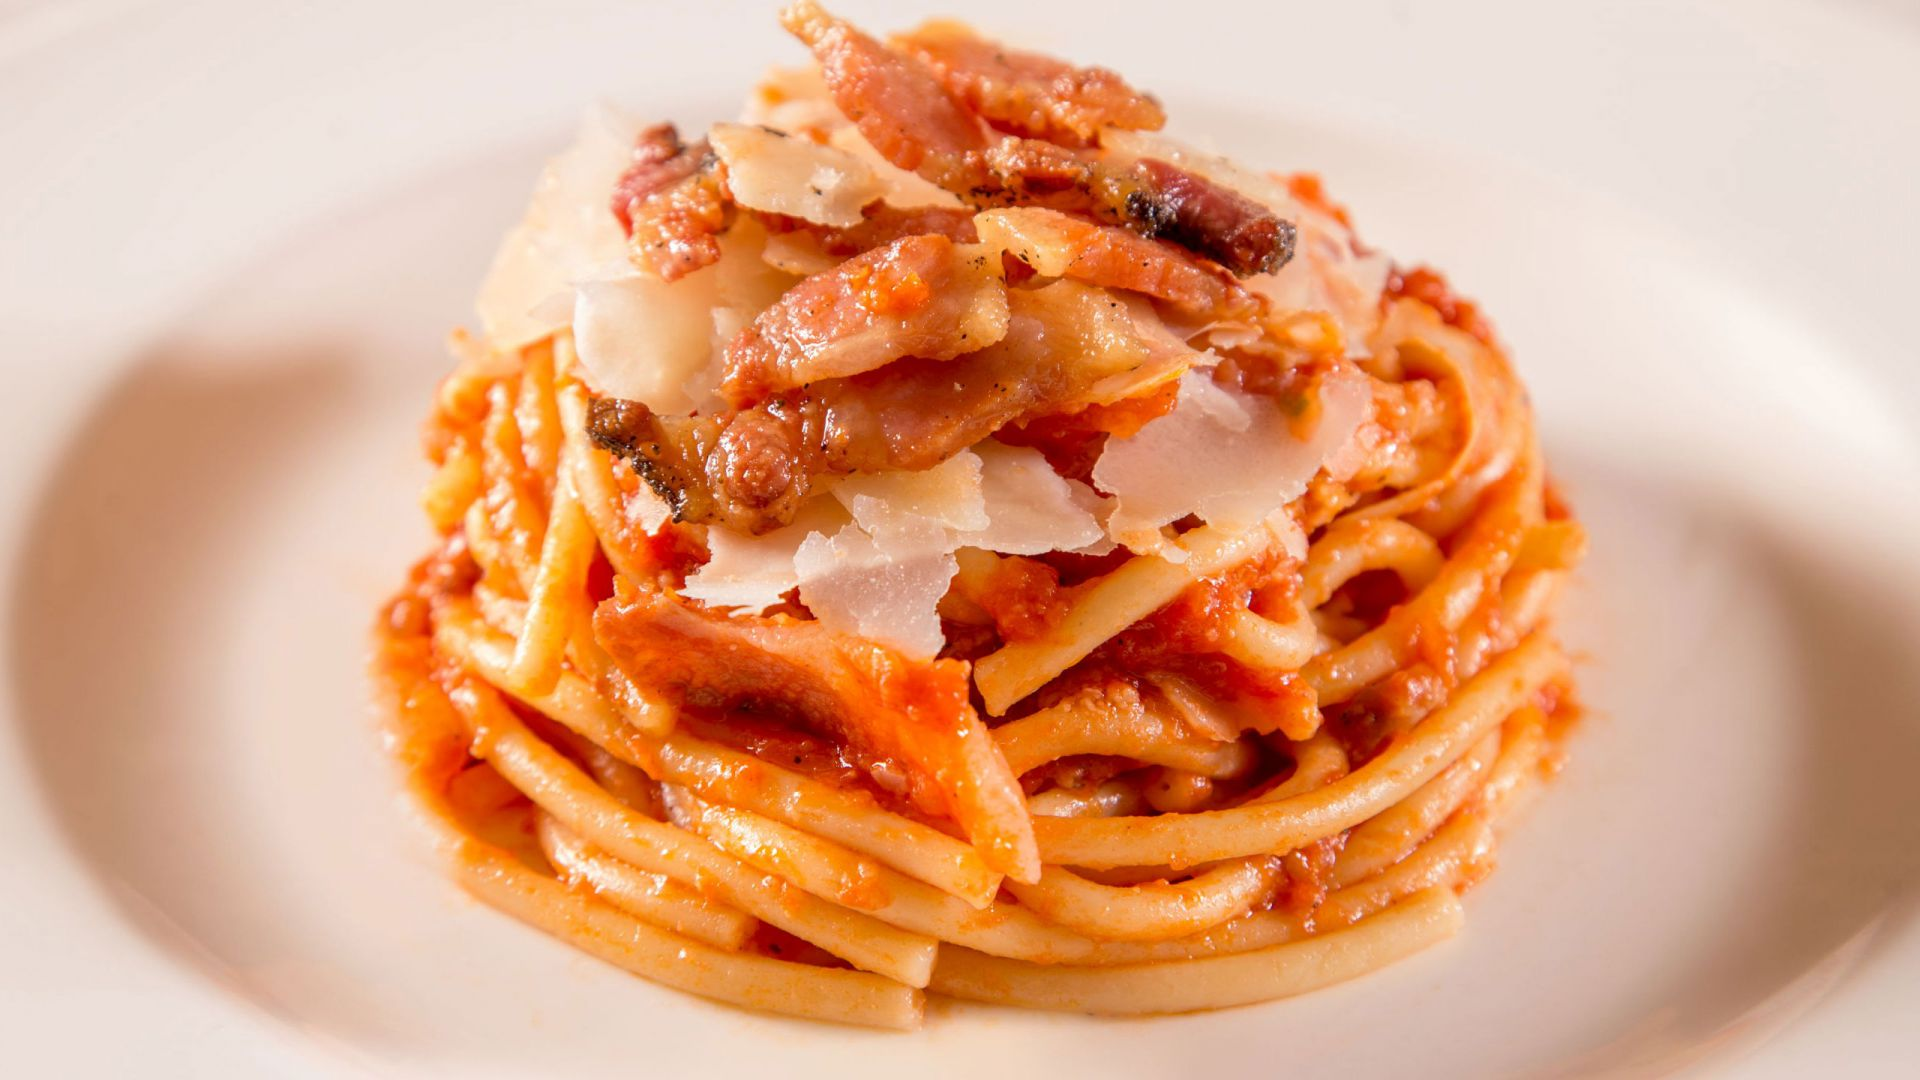 albergo-ottocento-rome-food-04